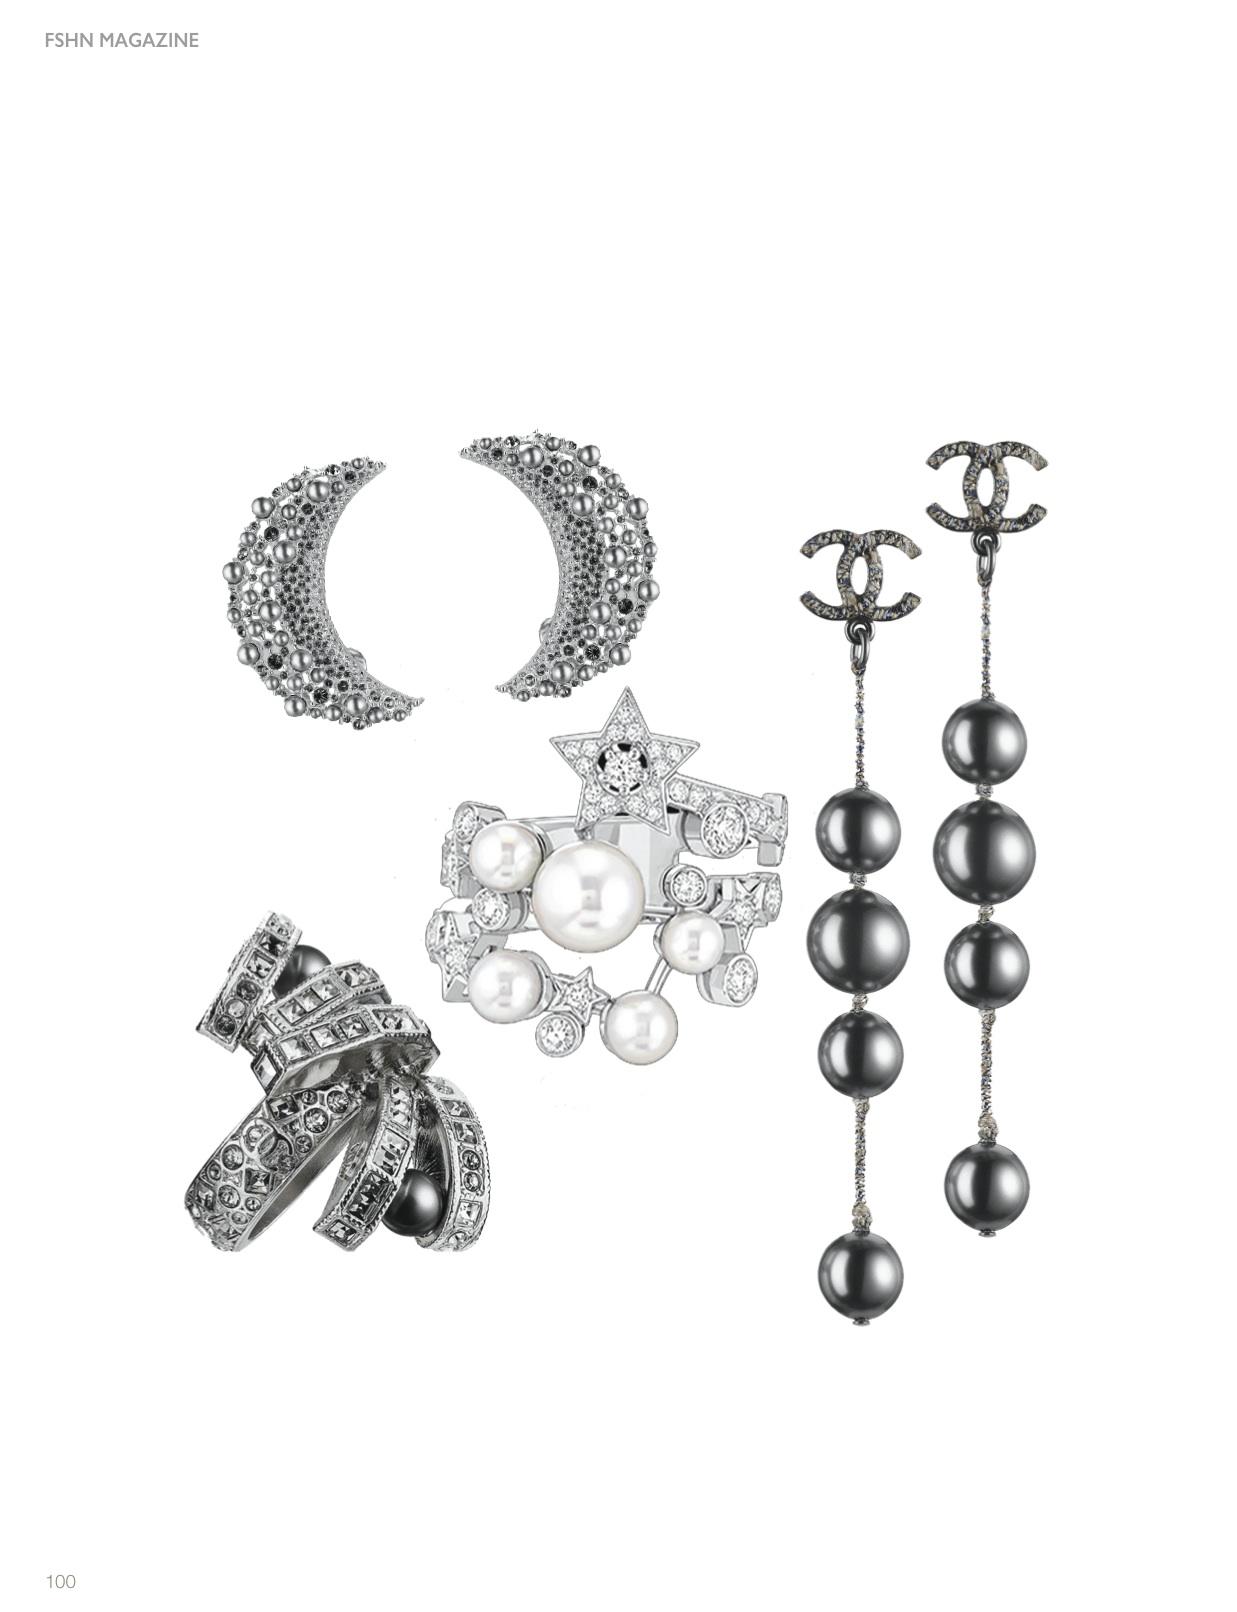 5 Top High-End Jewelry Brands • FSHN Magazine